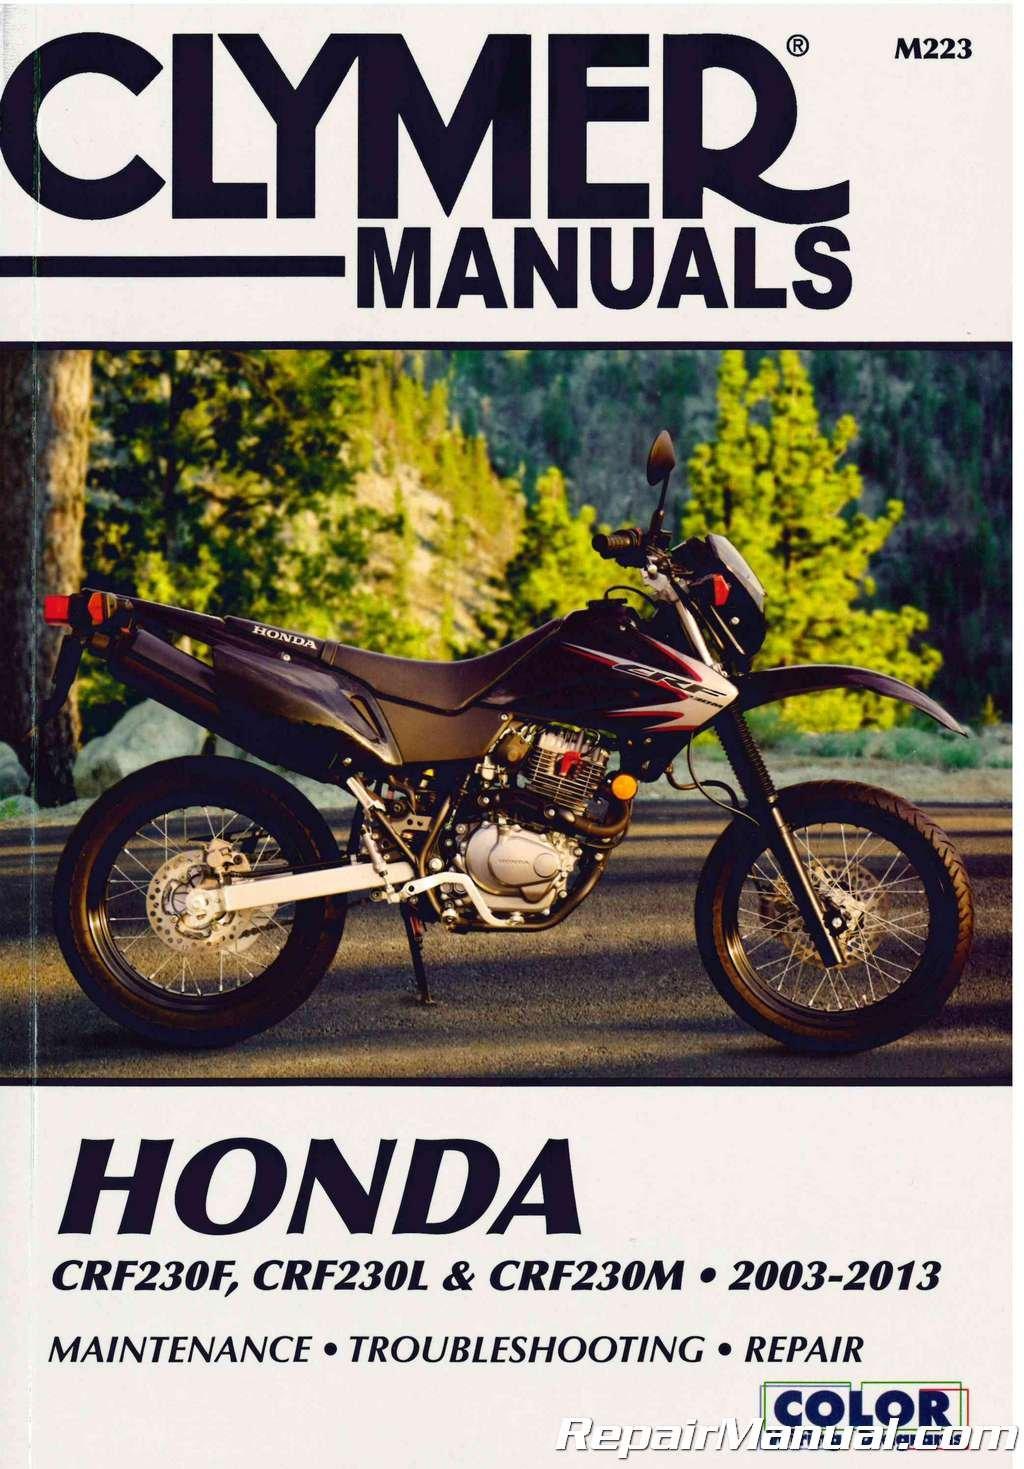 M223 2003 - 2013 Honda CRF230F CRF230L CRF230M Repair Manual by Clymer:  Manufacturer: Amazon.com: Books